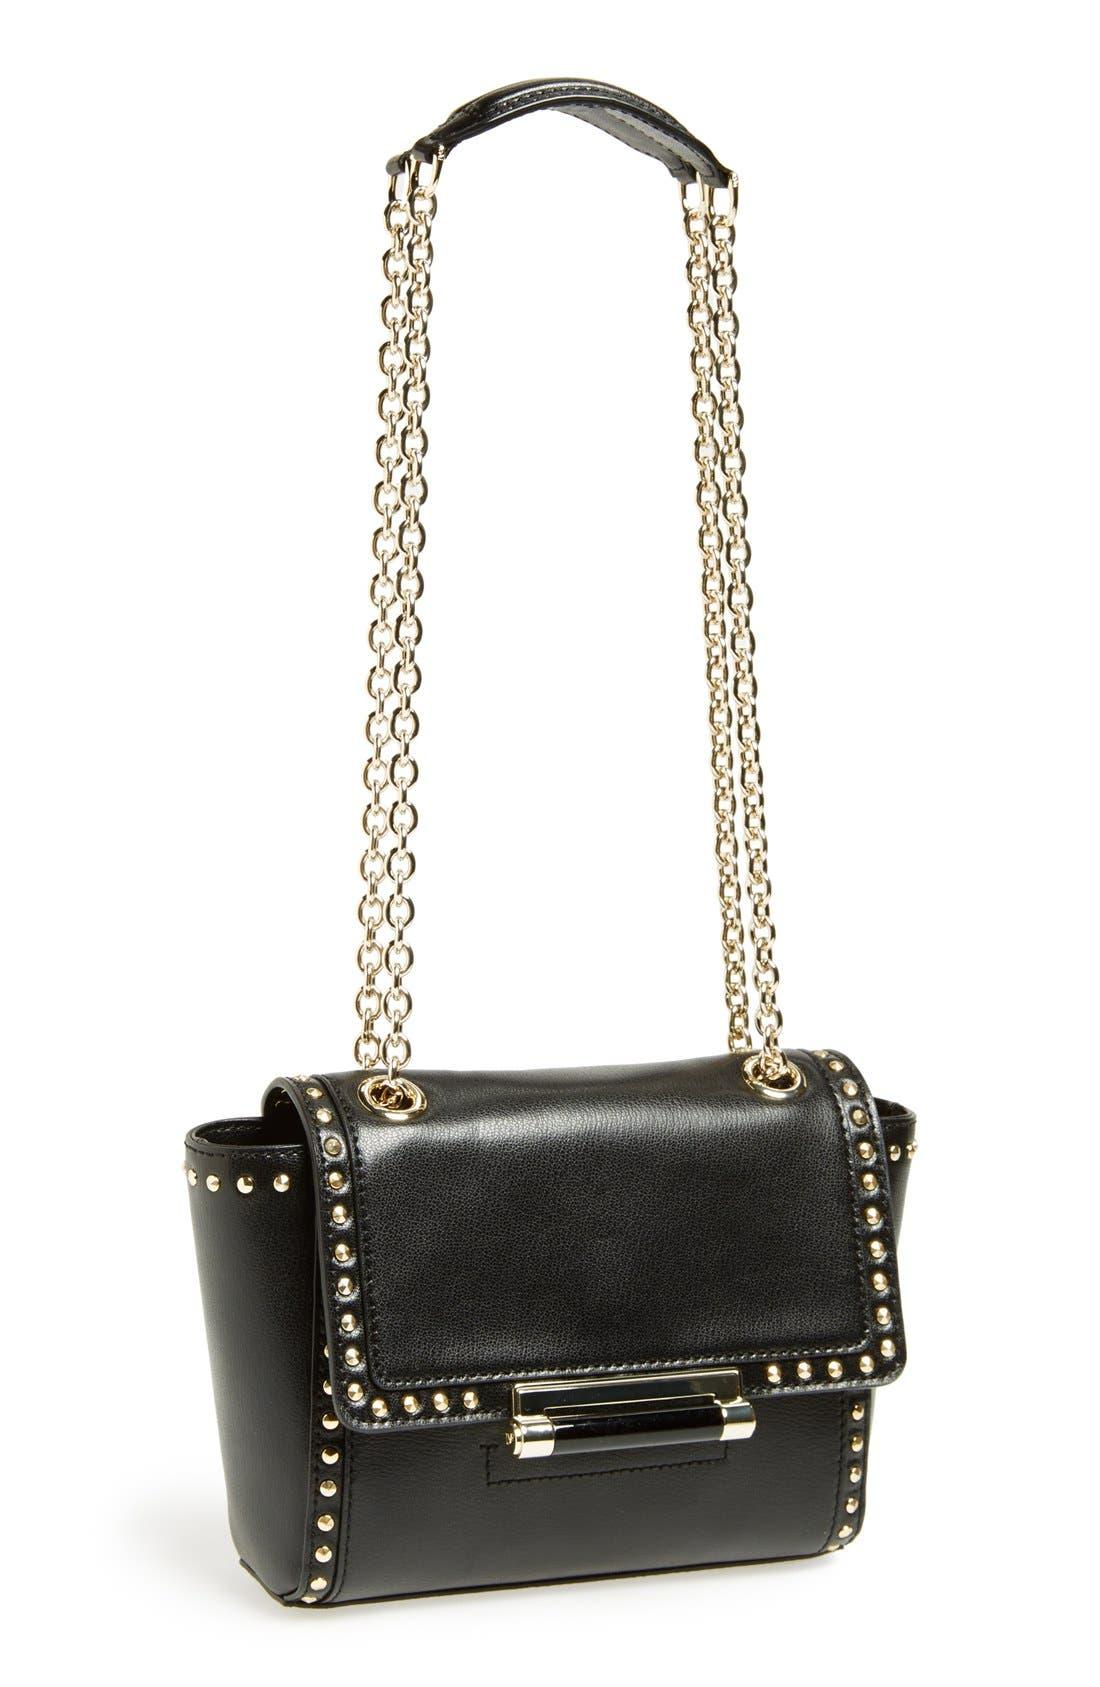 Alternate Image 1 Selected - Diane Von Furstenberg '440 - Mini' Stud Leather Crossbody Bag